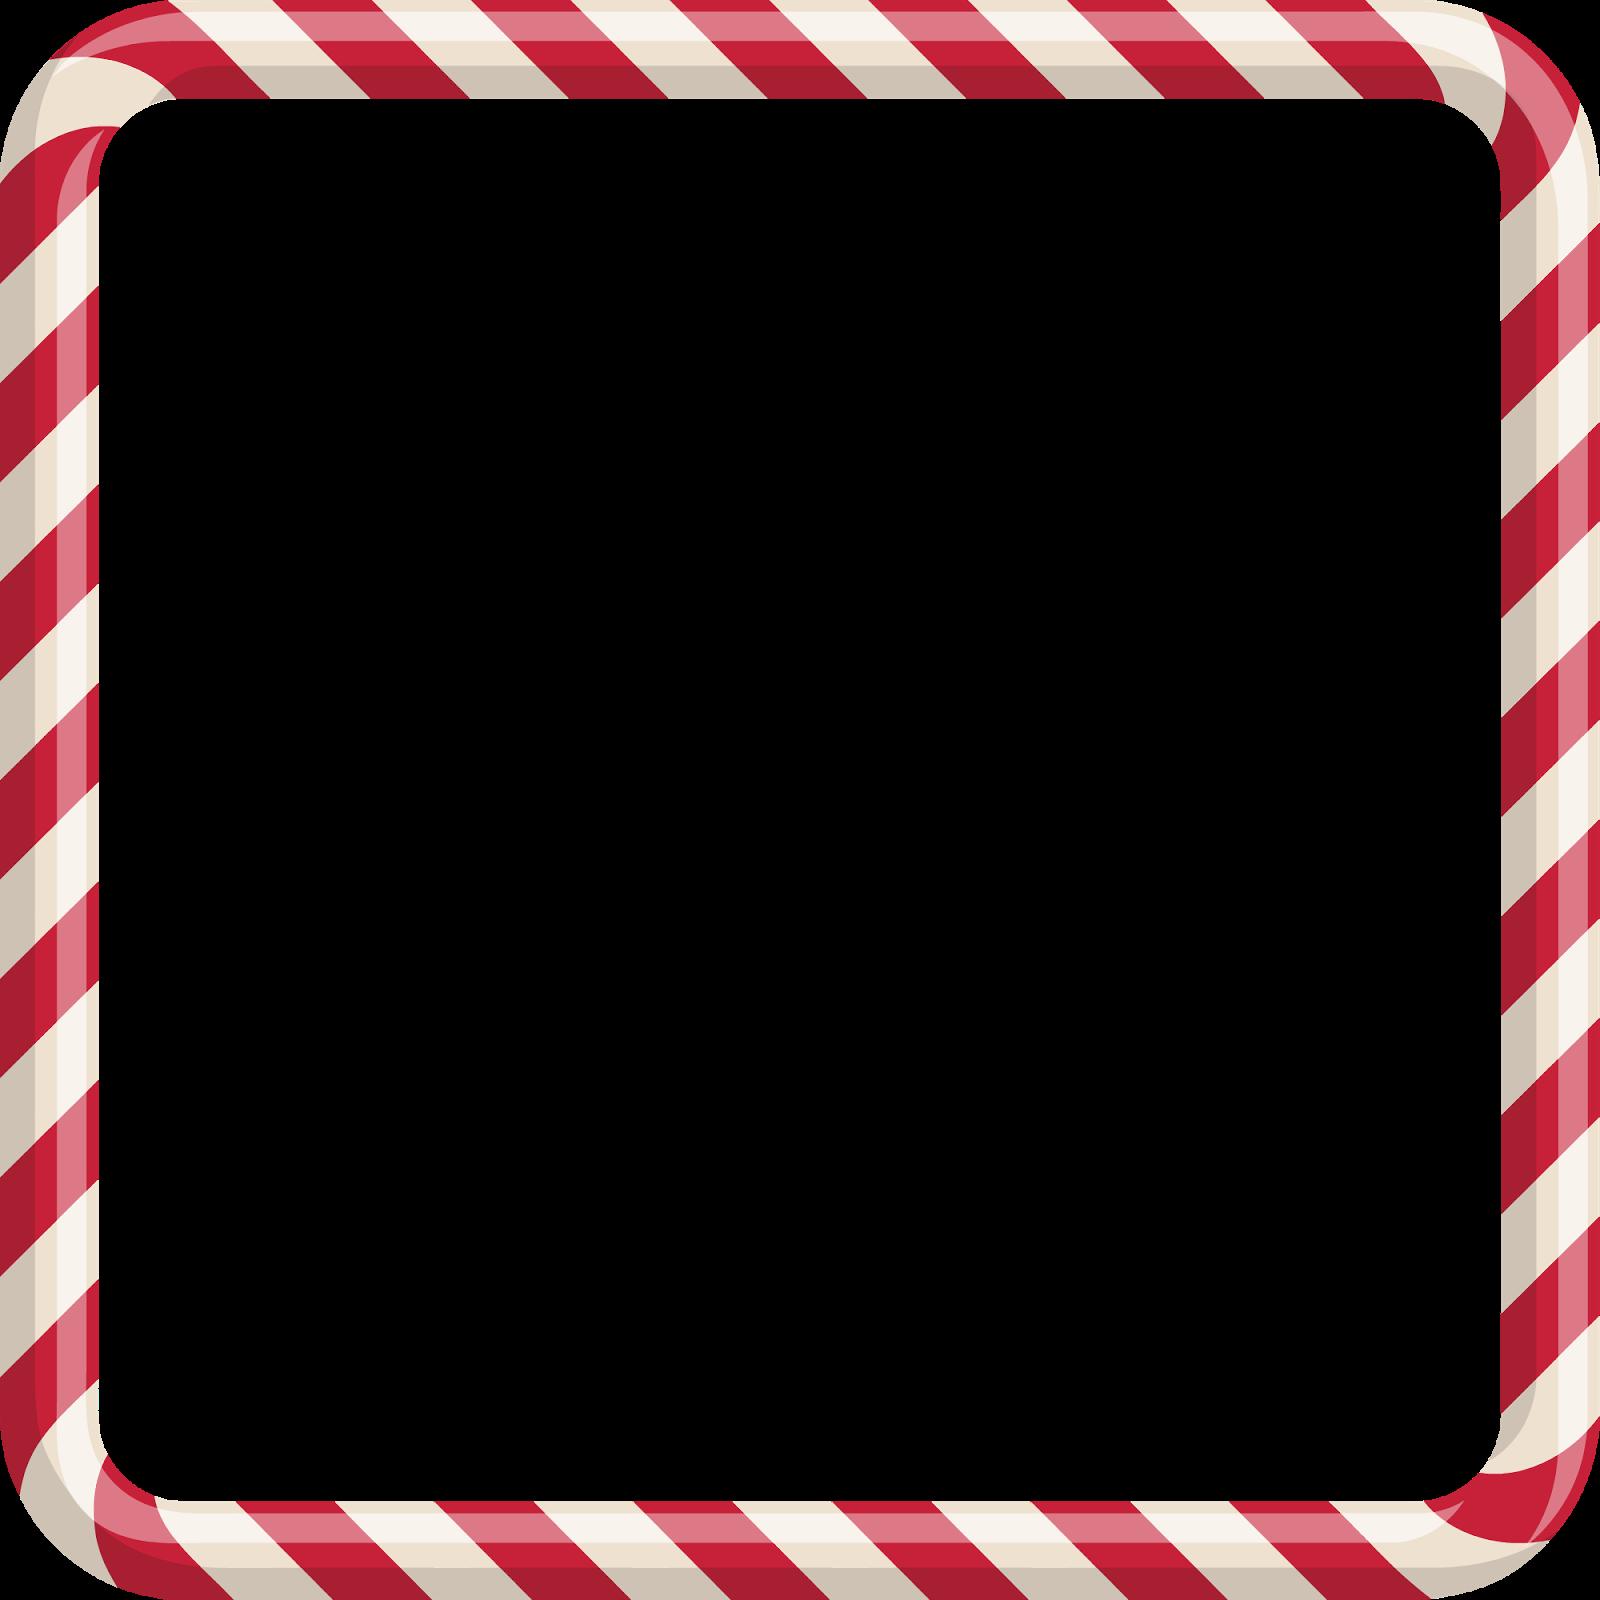 Wonderland In A Wardrobe: Candy Cane Frames Freebies